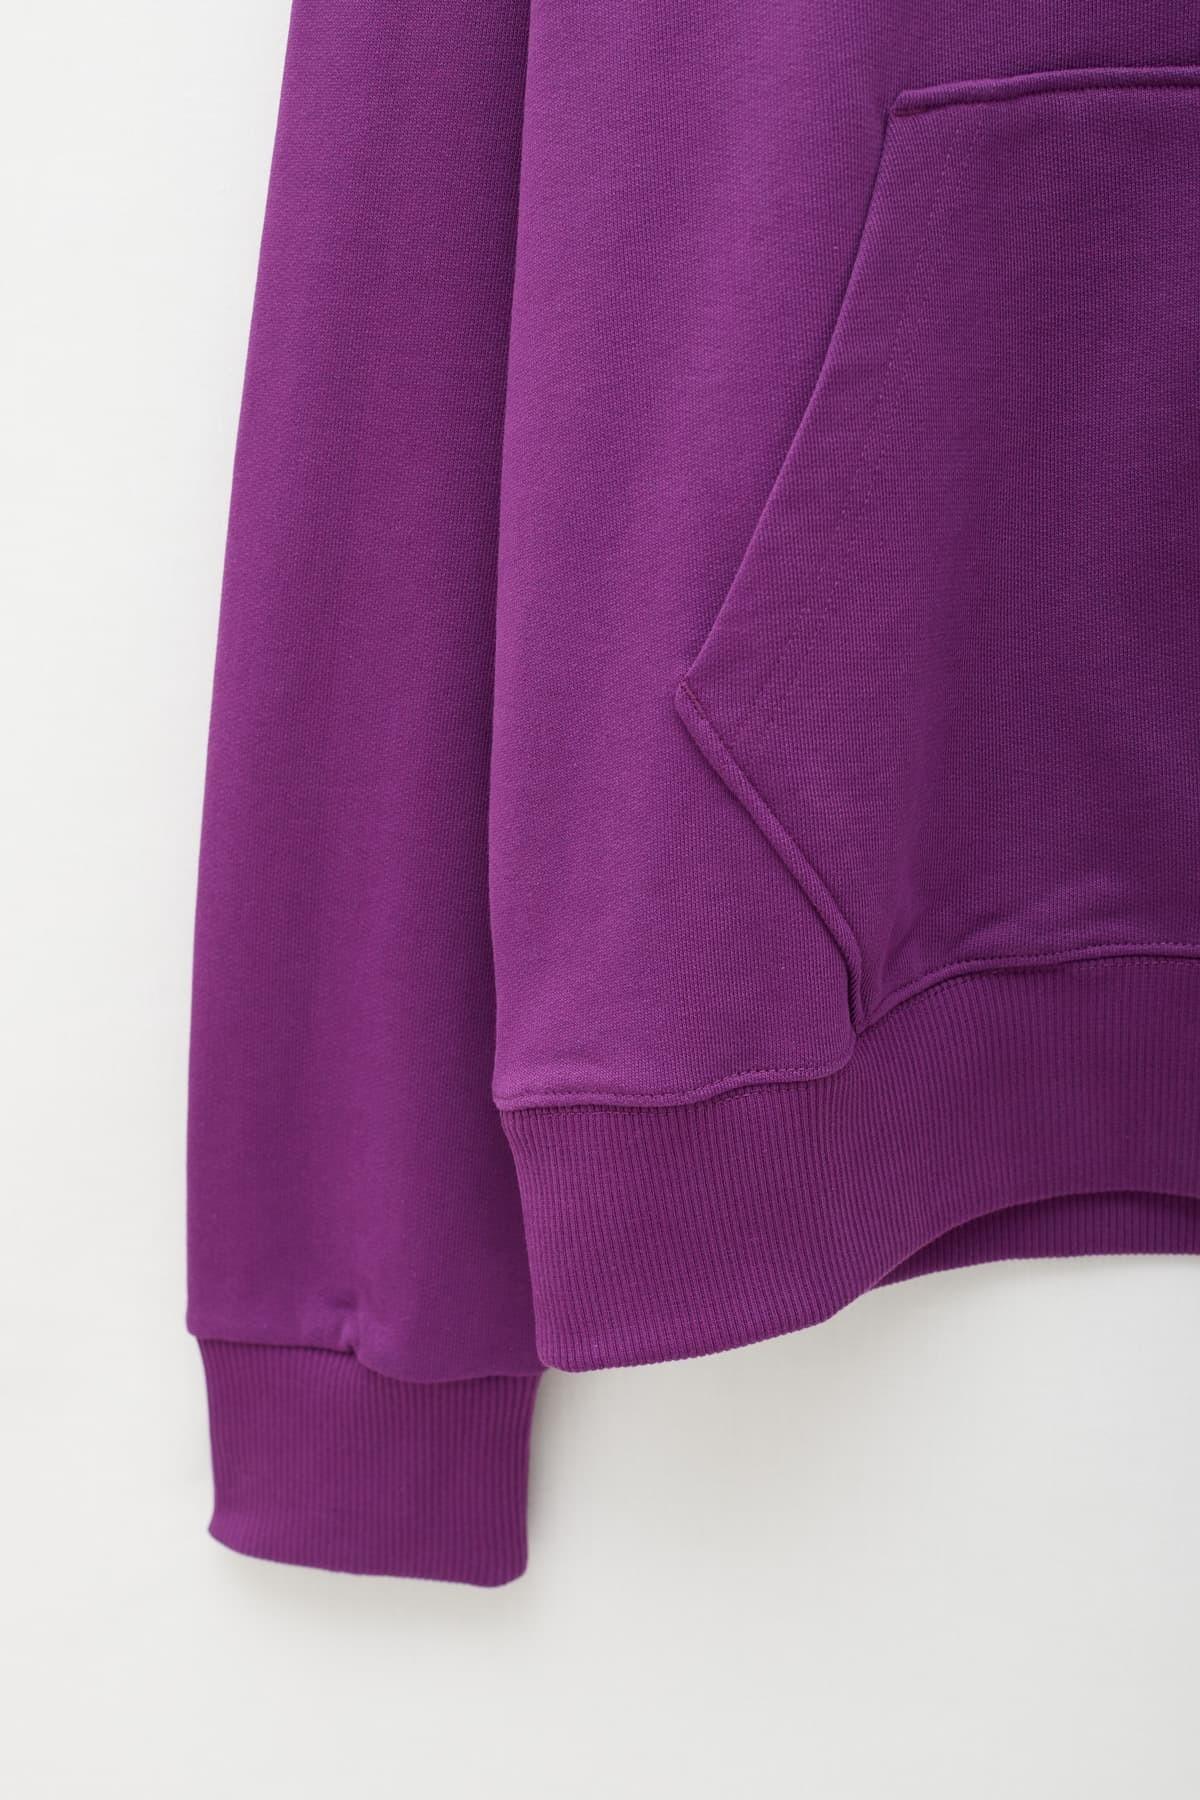 Comprar Marni Multi Stripes Shetland Wool Roundneck Sweater GCMG0163Q0